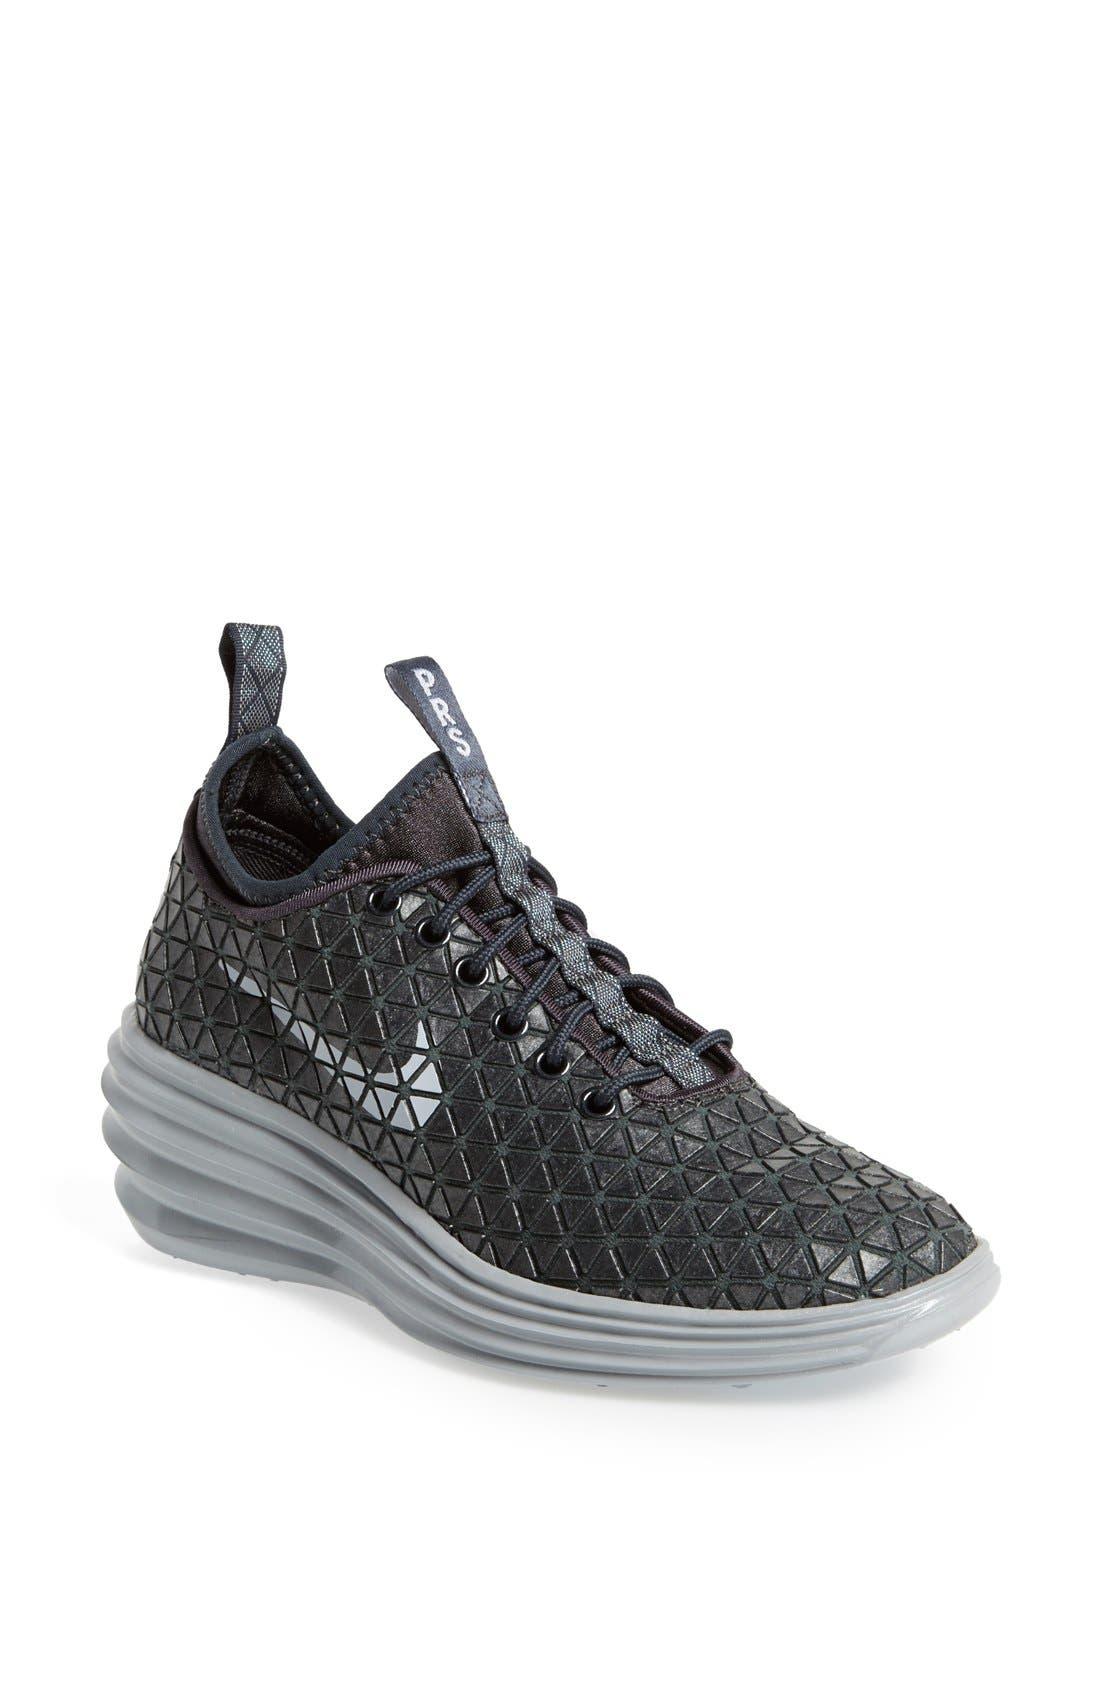 best website 1e069 d79f4 nike lunarelite sky hi womens sneakers. m5a9cafa2a4c4859817b19400  nike  lunar elite sky hi wedge sneaker main color